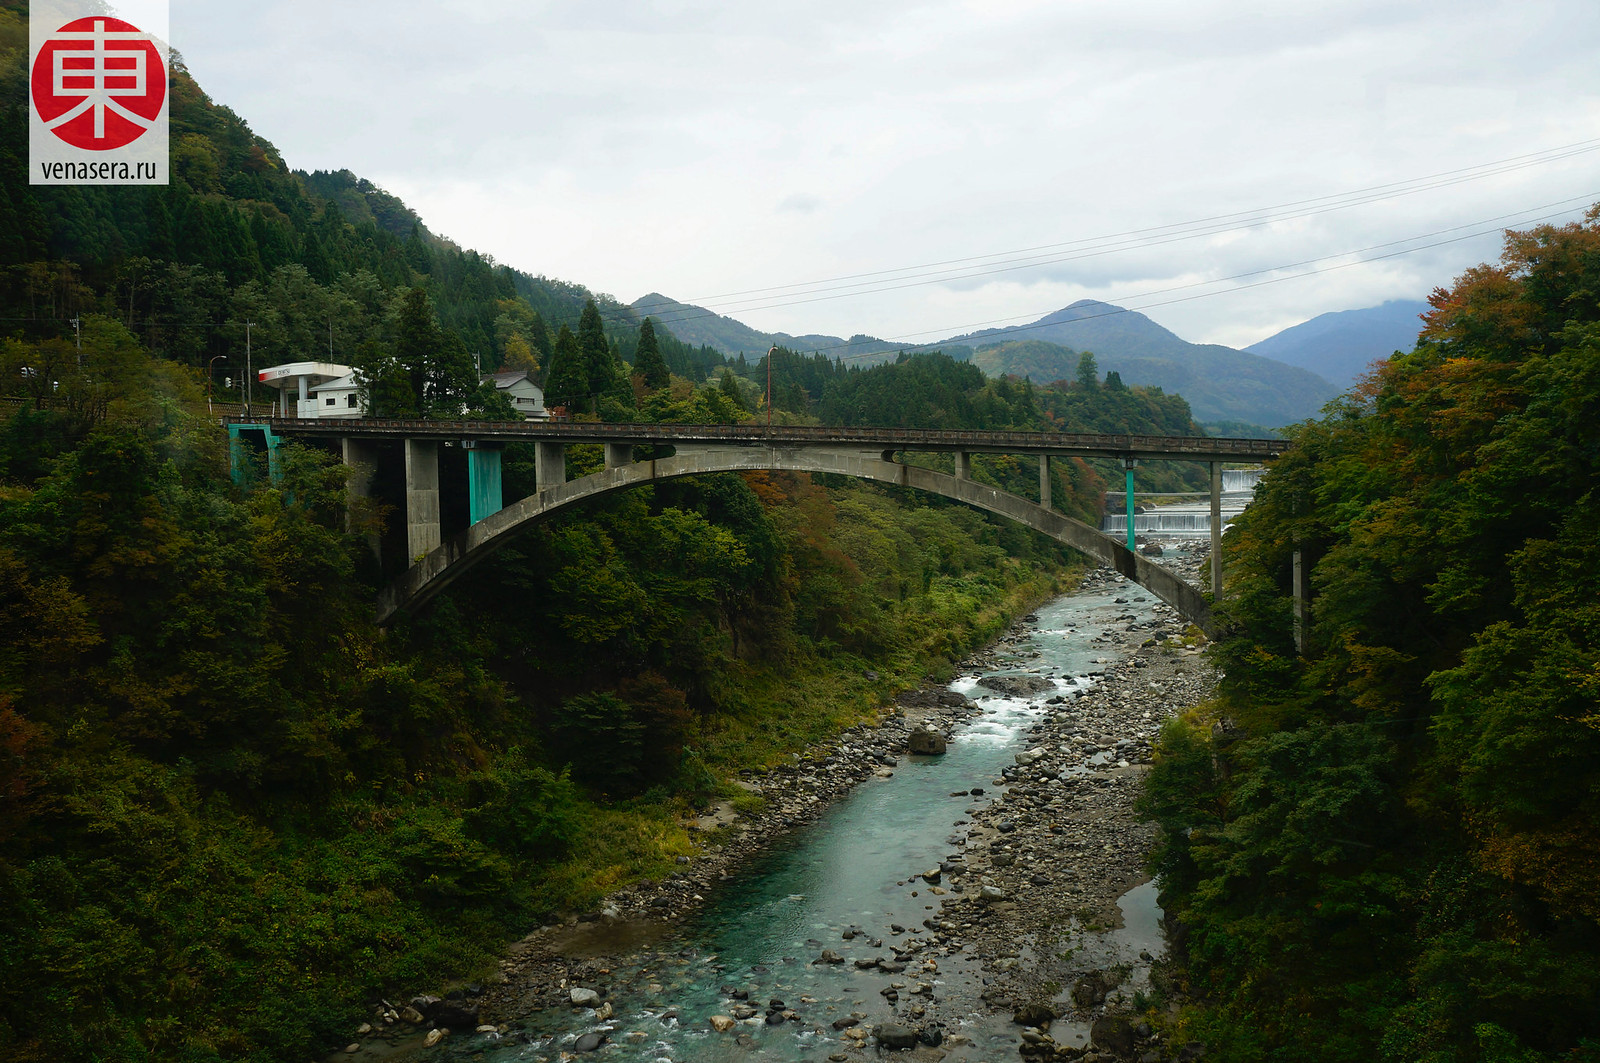 Поезд до гор Татэяма Куробэ, Тояма, Японские Альпы Татэяма Куробэ, Татэяма Куробэ, Tateyama Kurobe Alpine Route, 立山黒部, 立山黒部アルペンルート